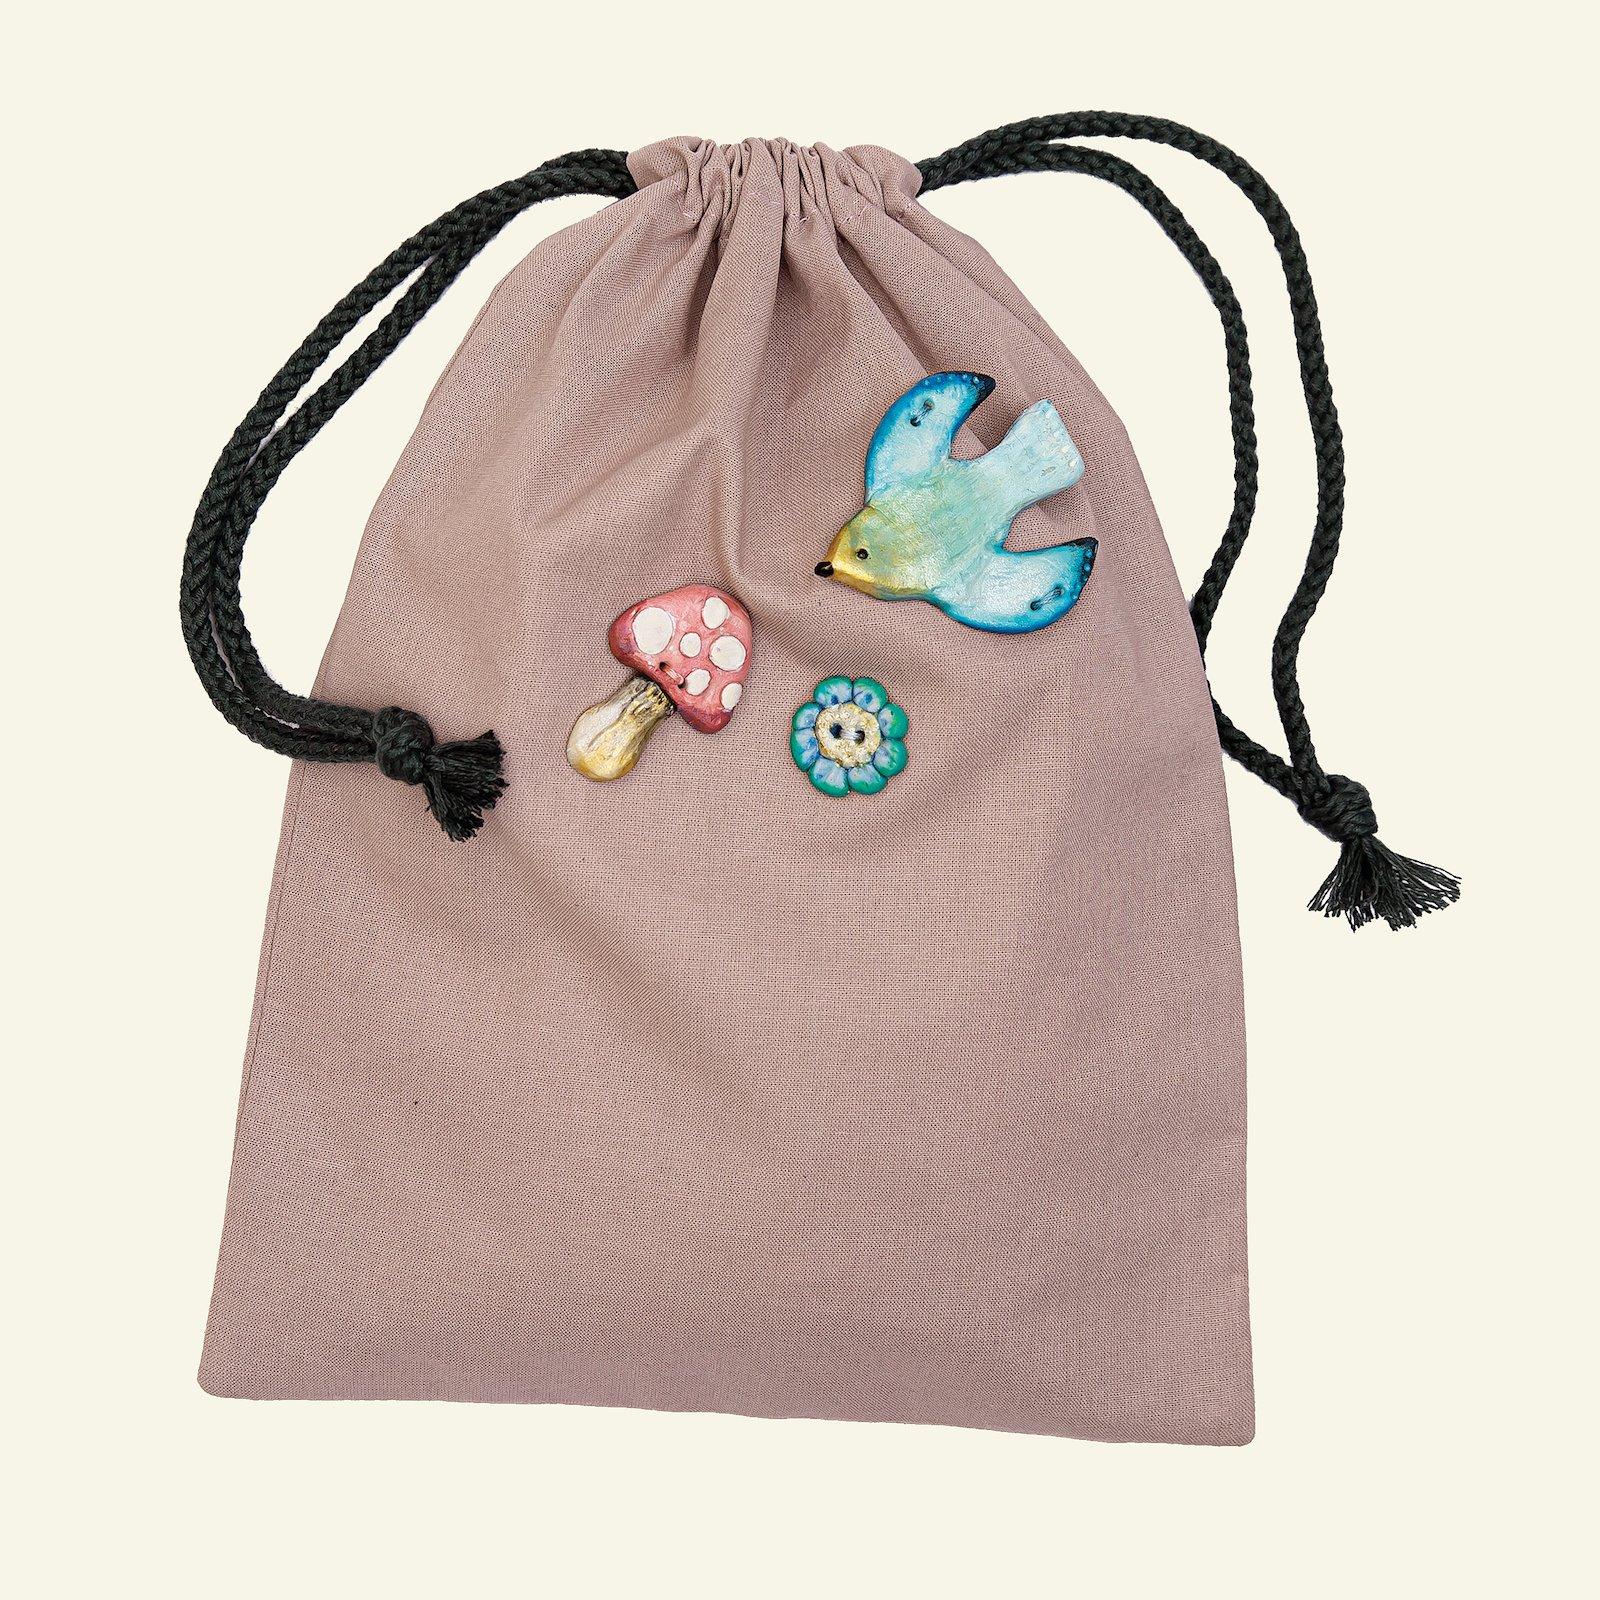 Gym bag, pencil and fruit bag p90277_4353_75228_sskit